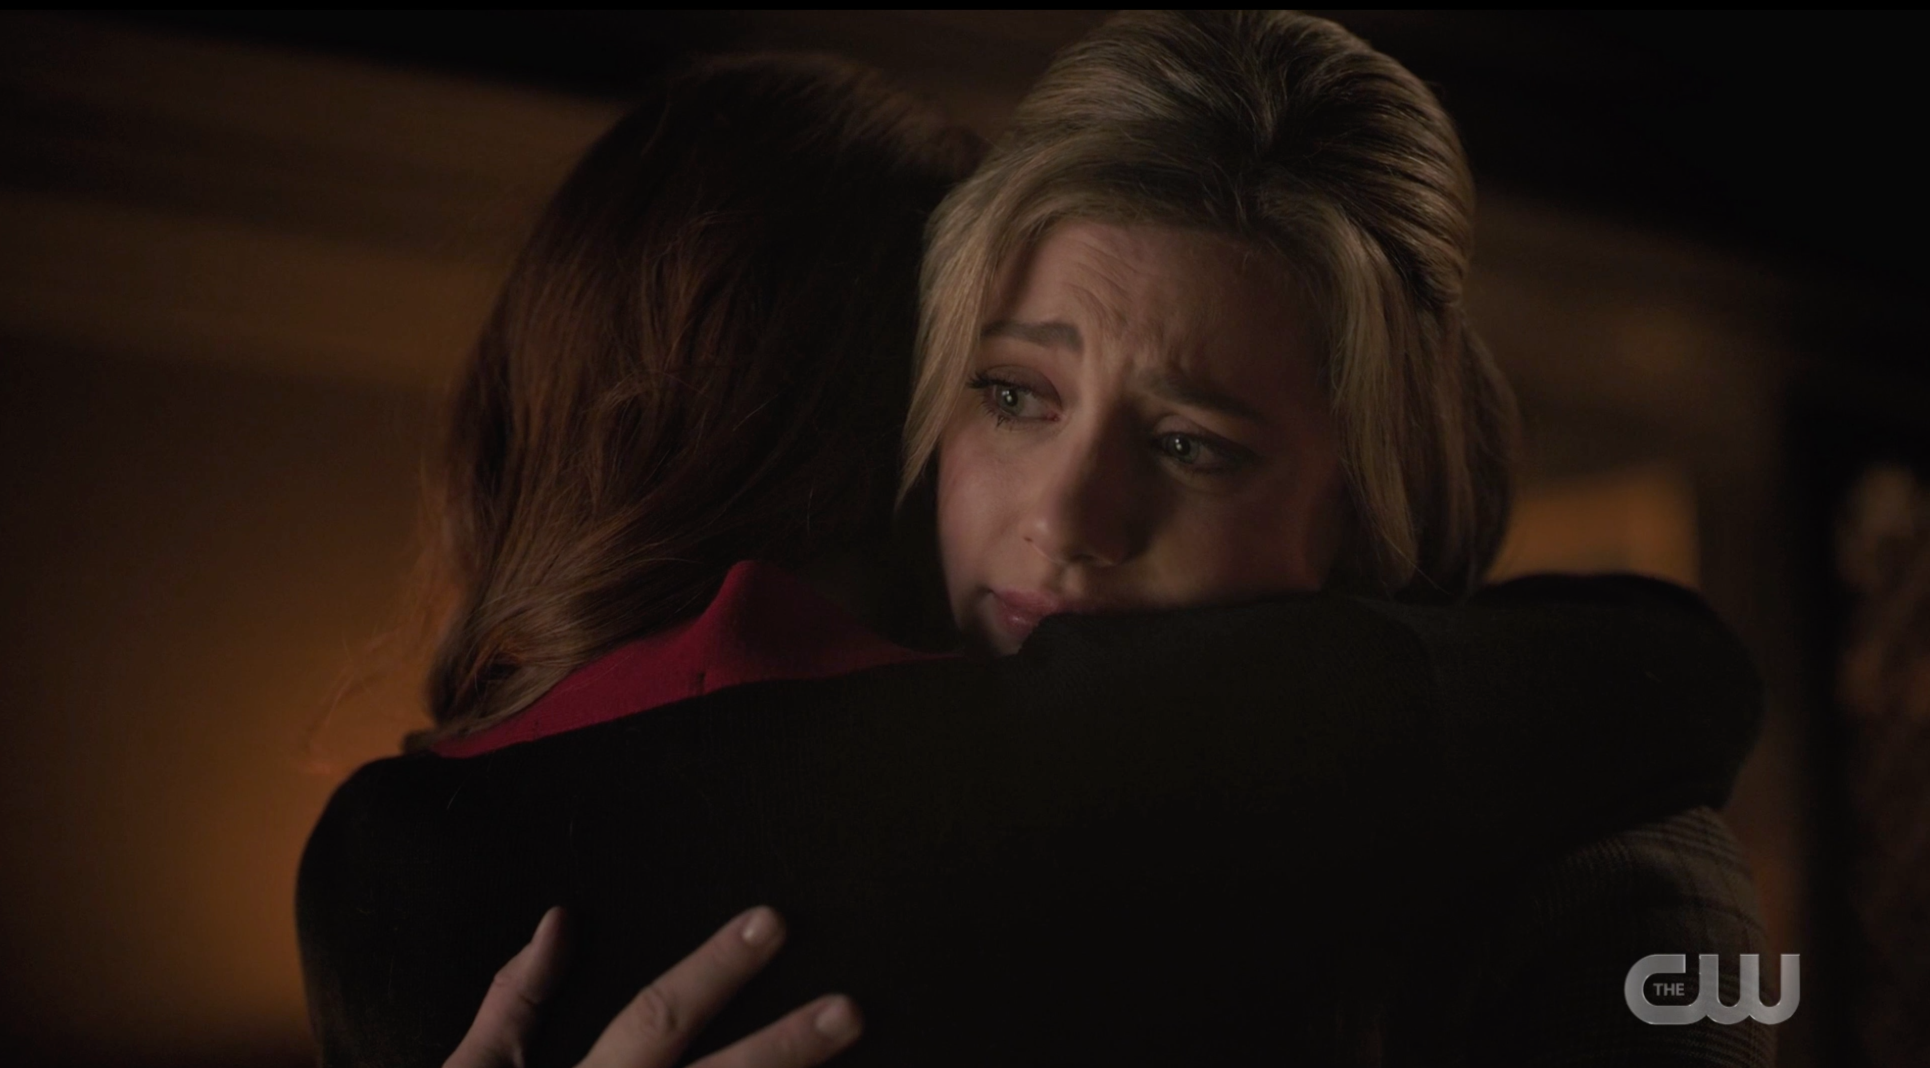 Cheryl and Betty hugging